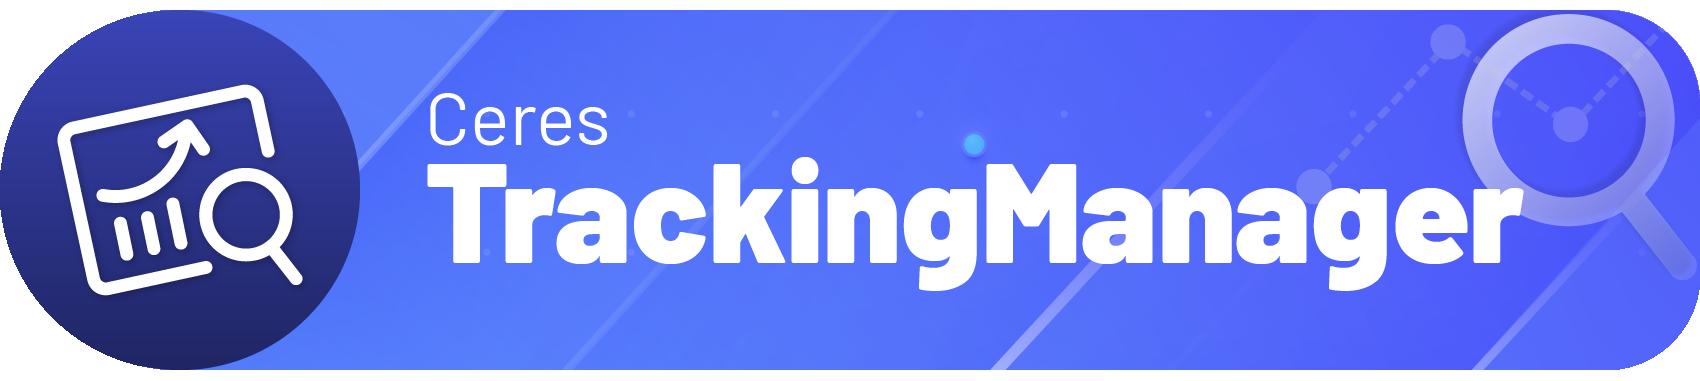 TrackingManager